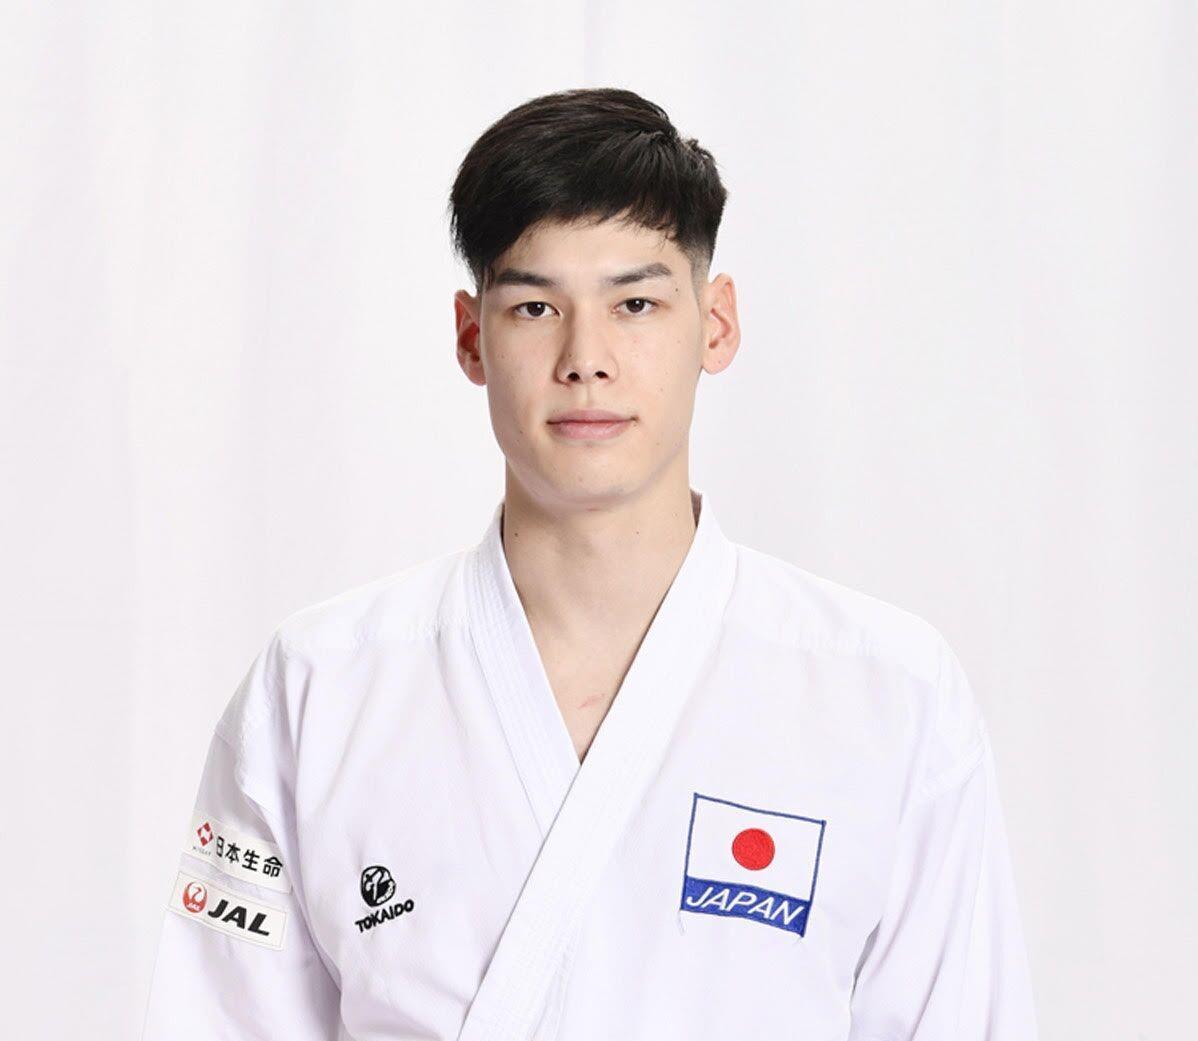 Karateka Ken Nishimura reignites passion for sport during coronavirus crisis (Source: The Japan Times)